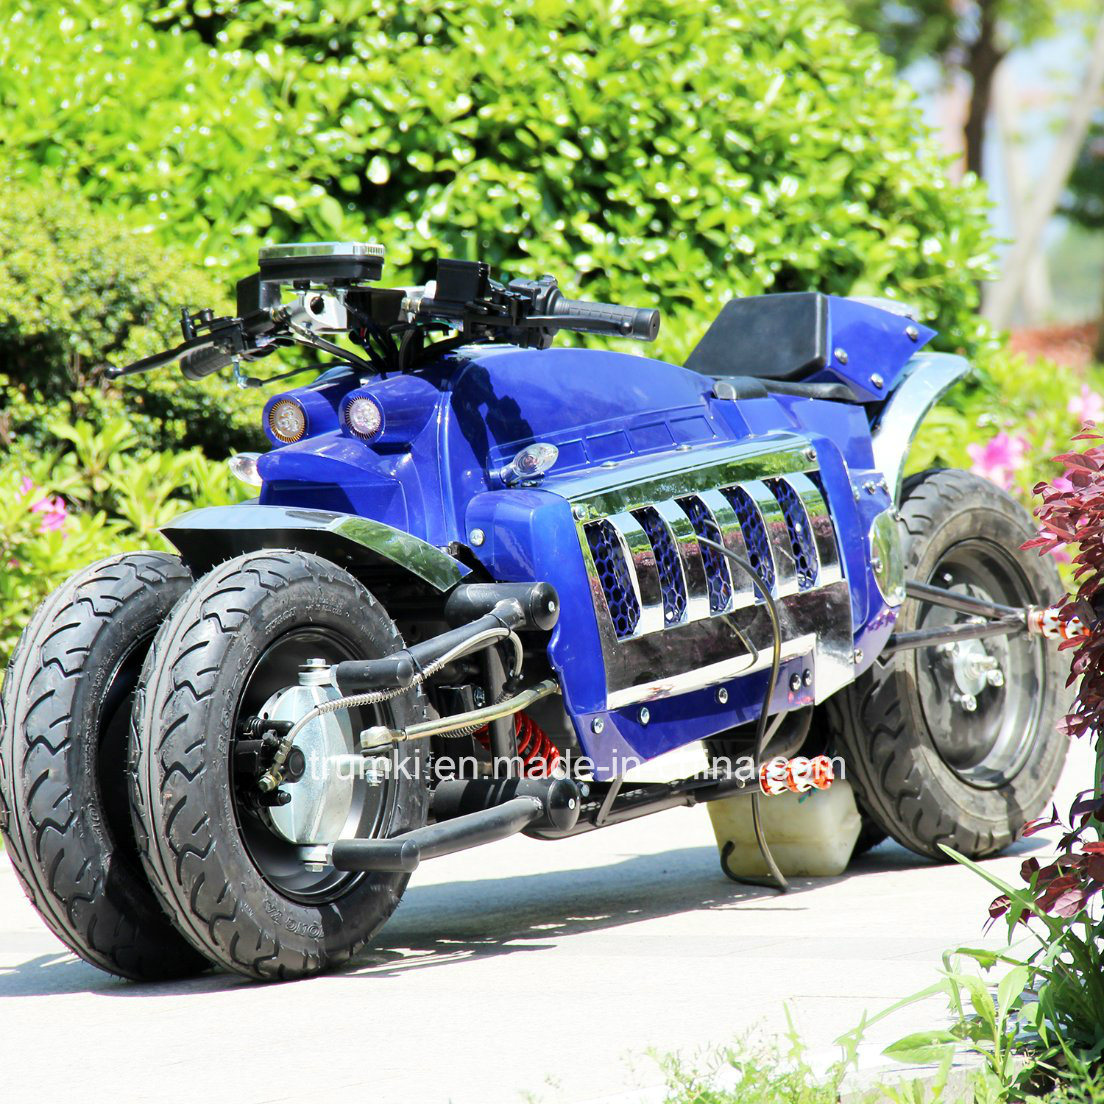 Dodge Tomahawk For Sale >> Hot Item Trumki Electric Hot Sale Dodge Tomahawk Pocket Bike 150cc Racing Bike